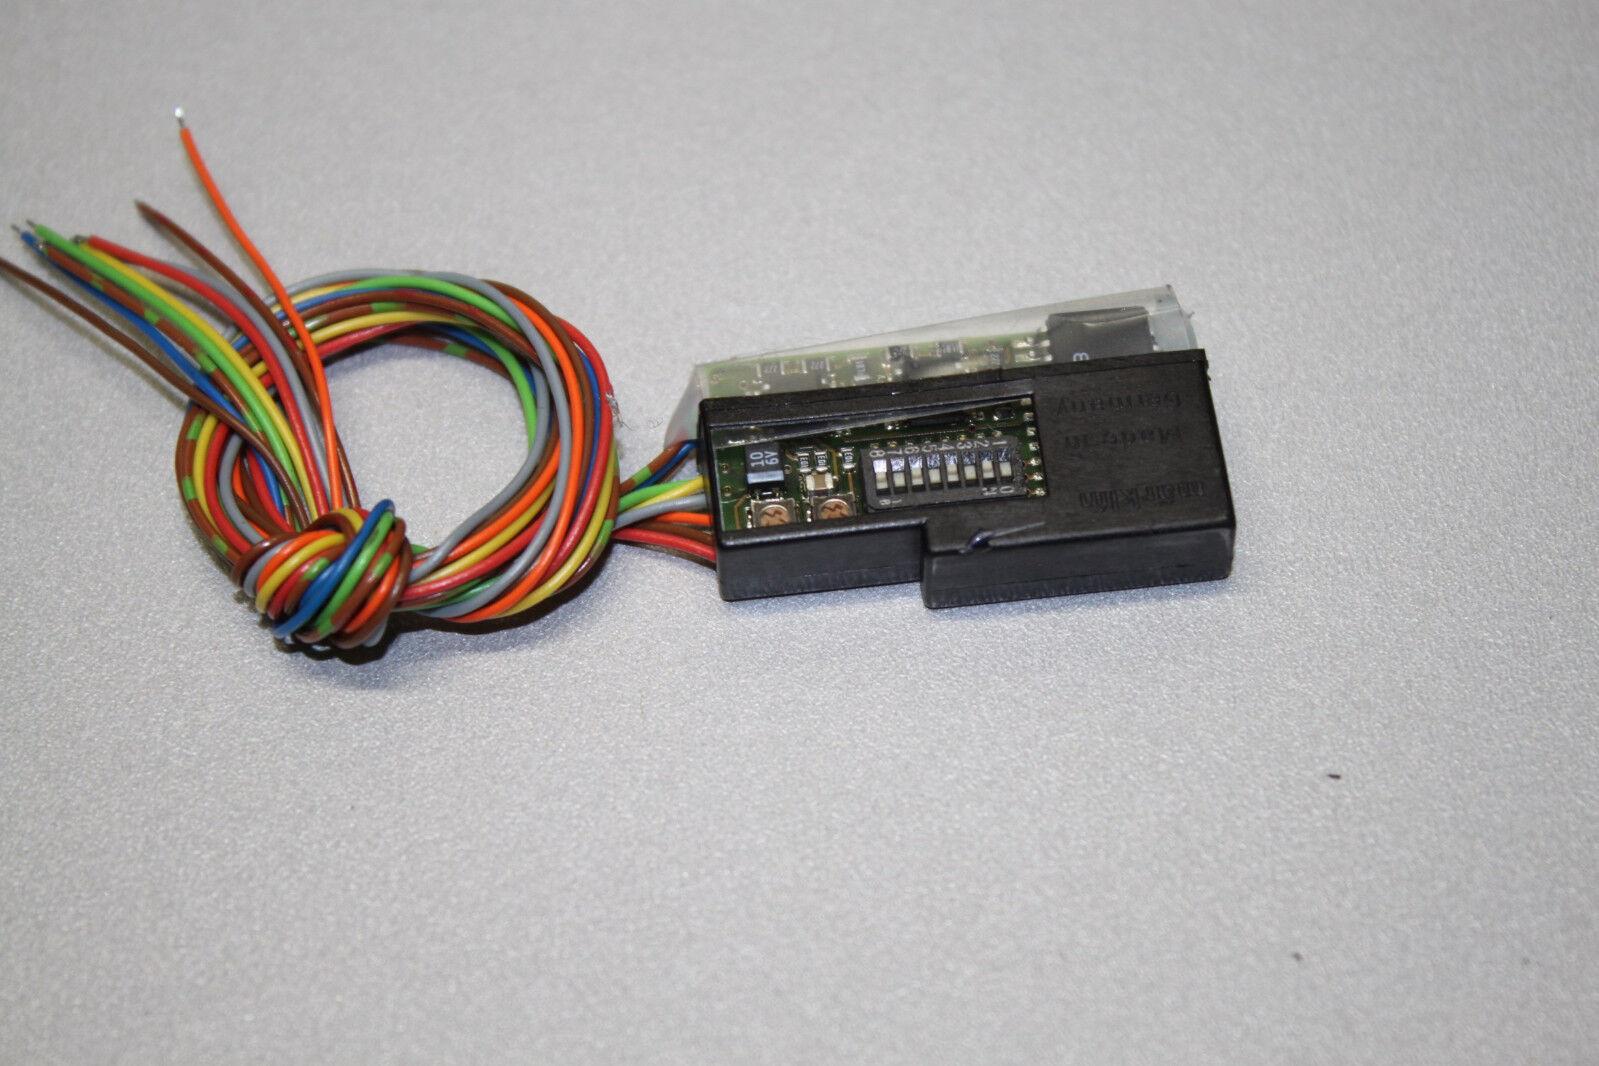 Märklin 60905 Digital-Hochleistungselektronik mit 3 Schaltausgängen Spur H0 OVP